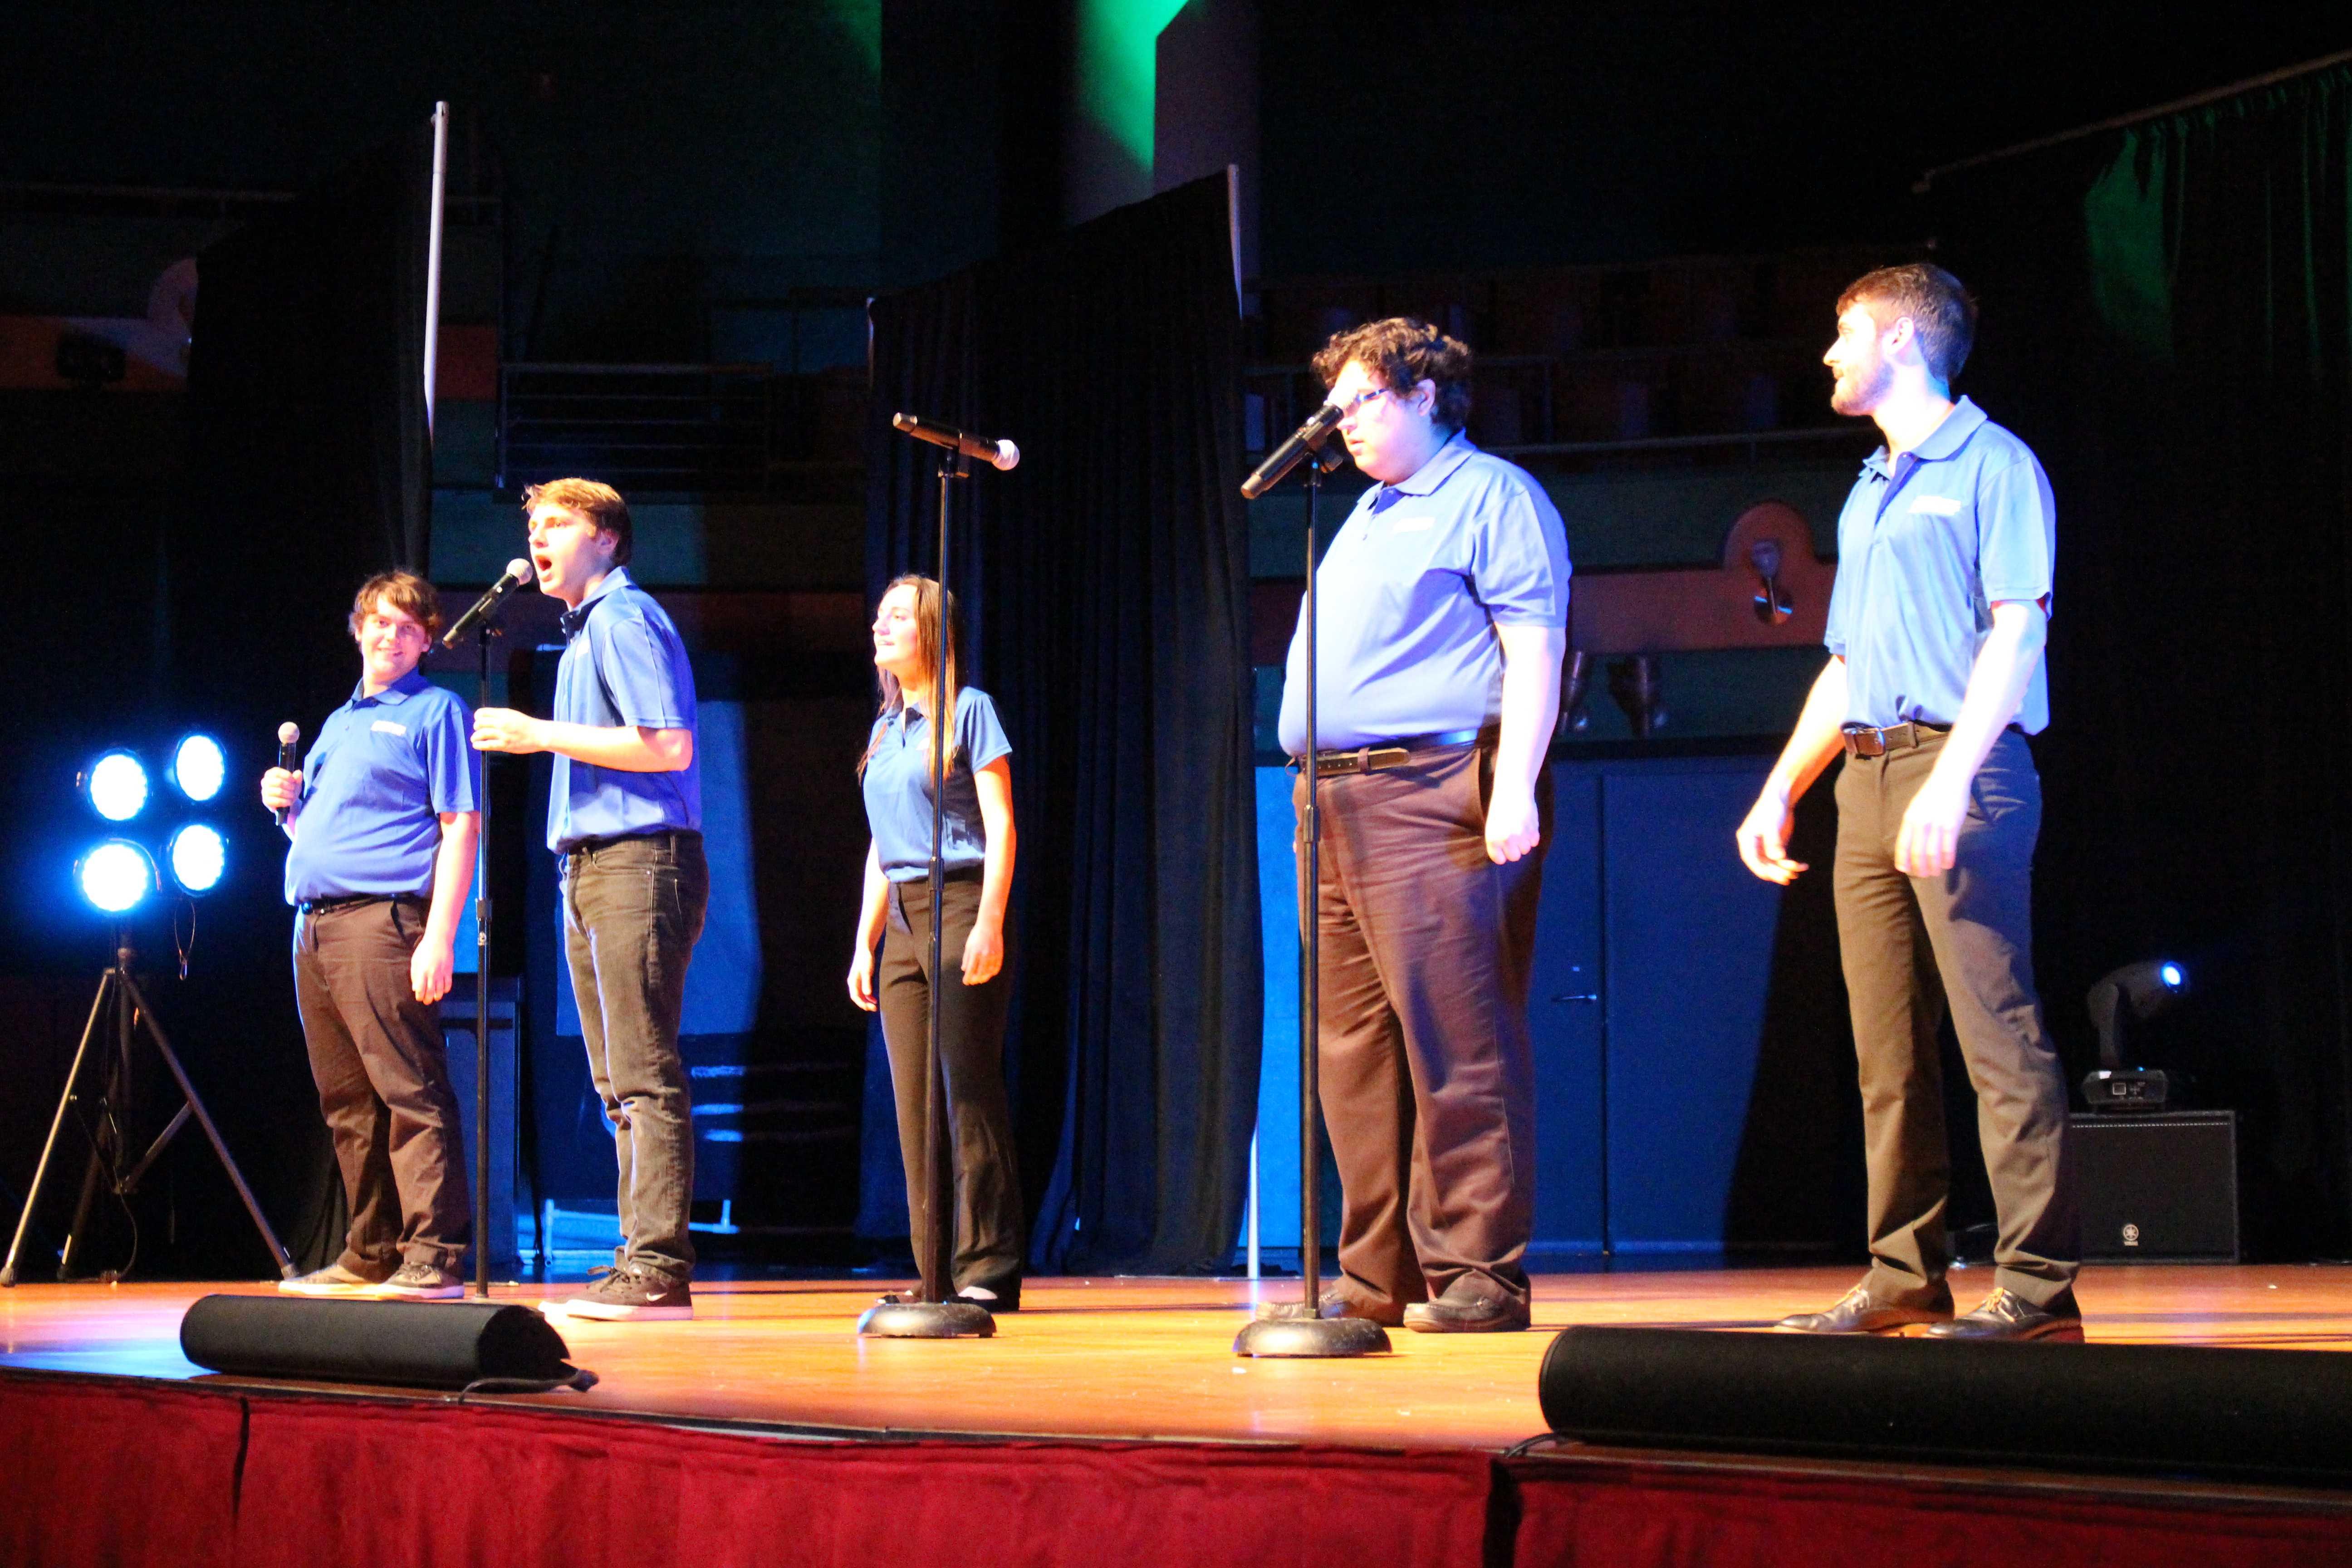 Student organizations compete at Islander Revue